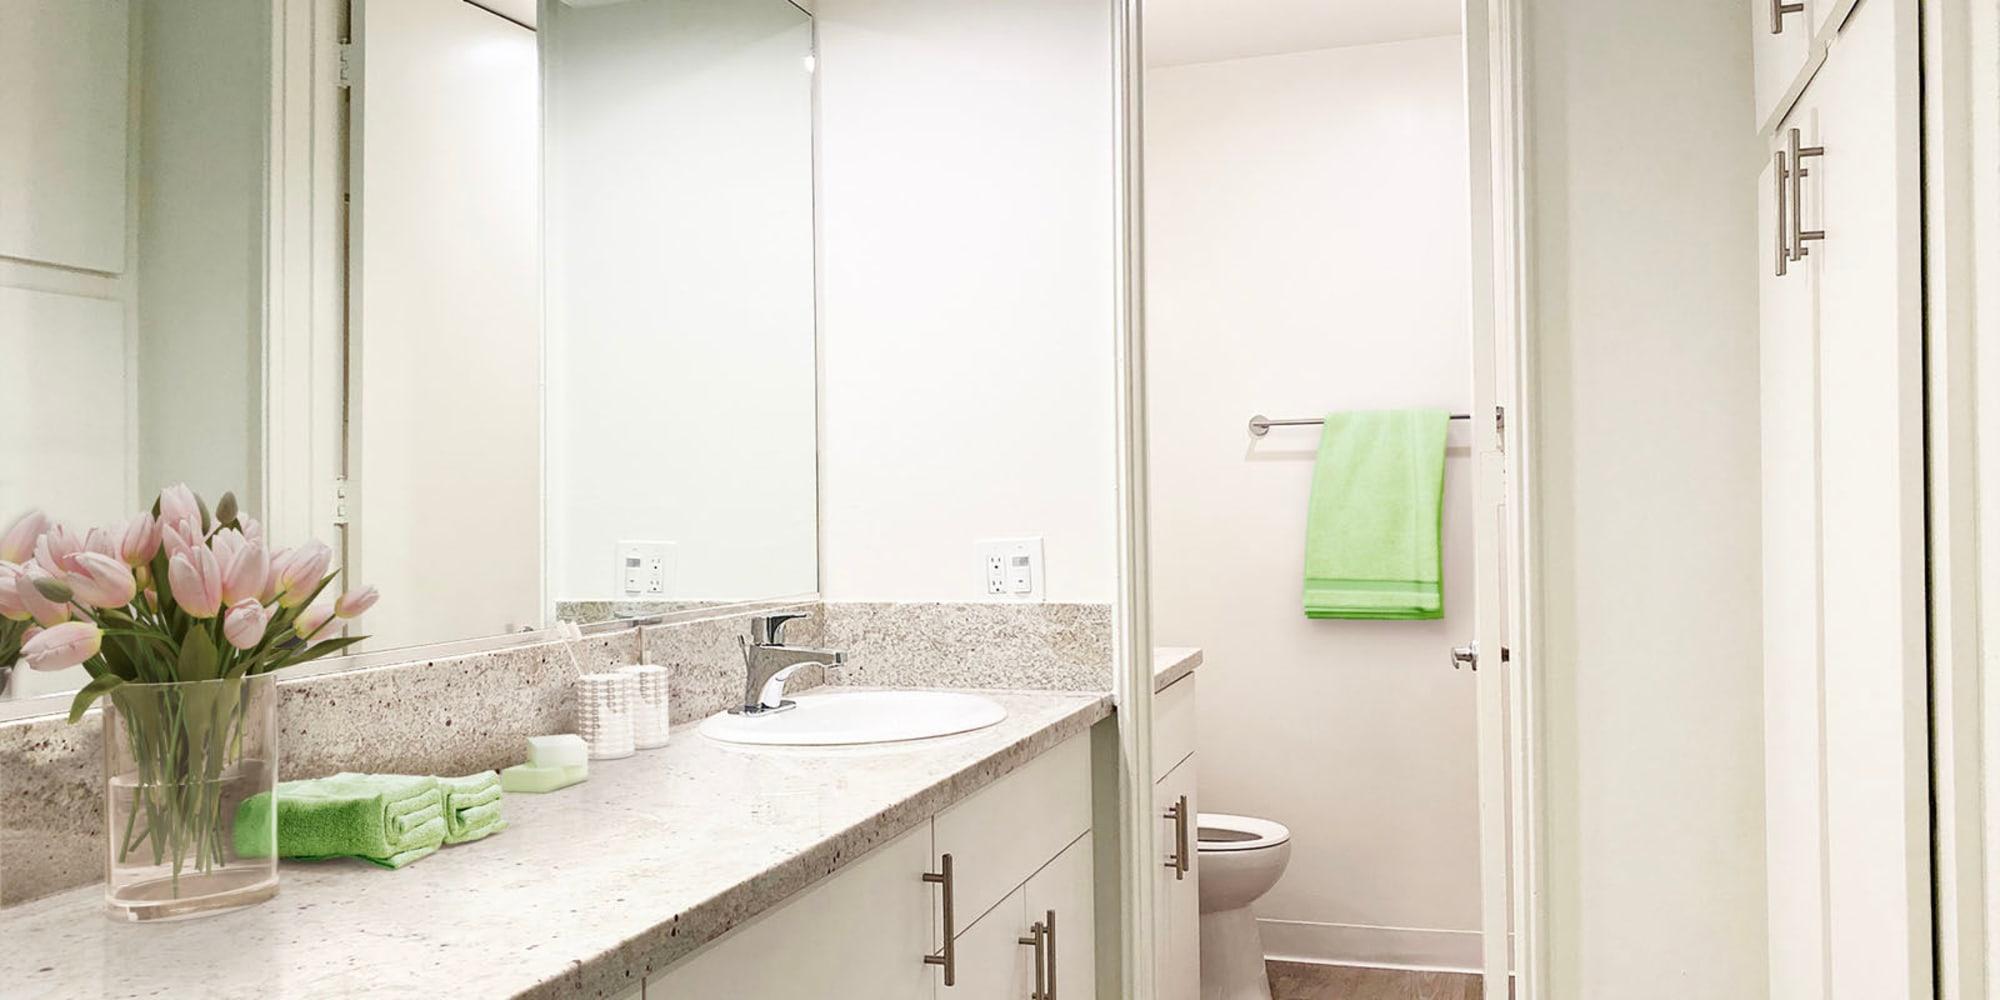 Model home's bathroom with extra storage and a granite countertop at Casa Granada in Los Angeles, California